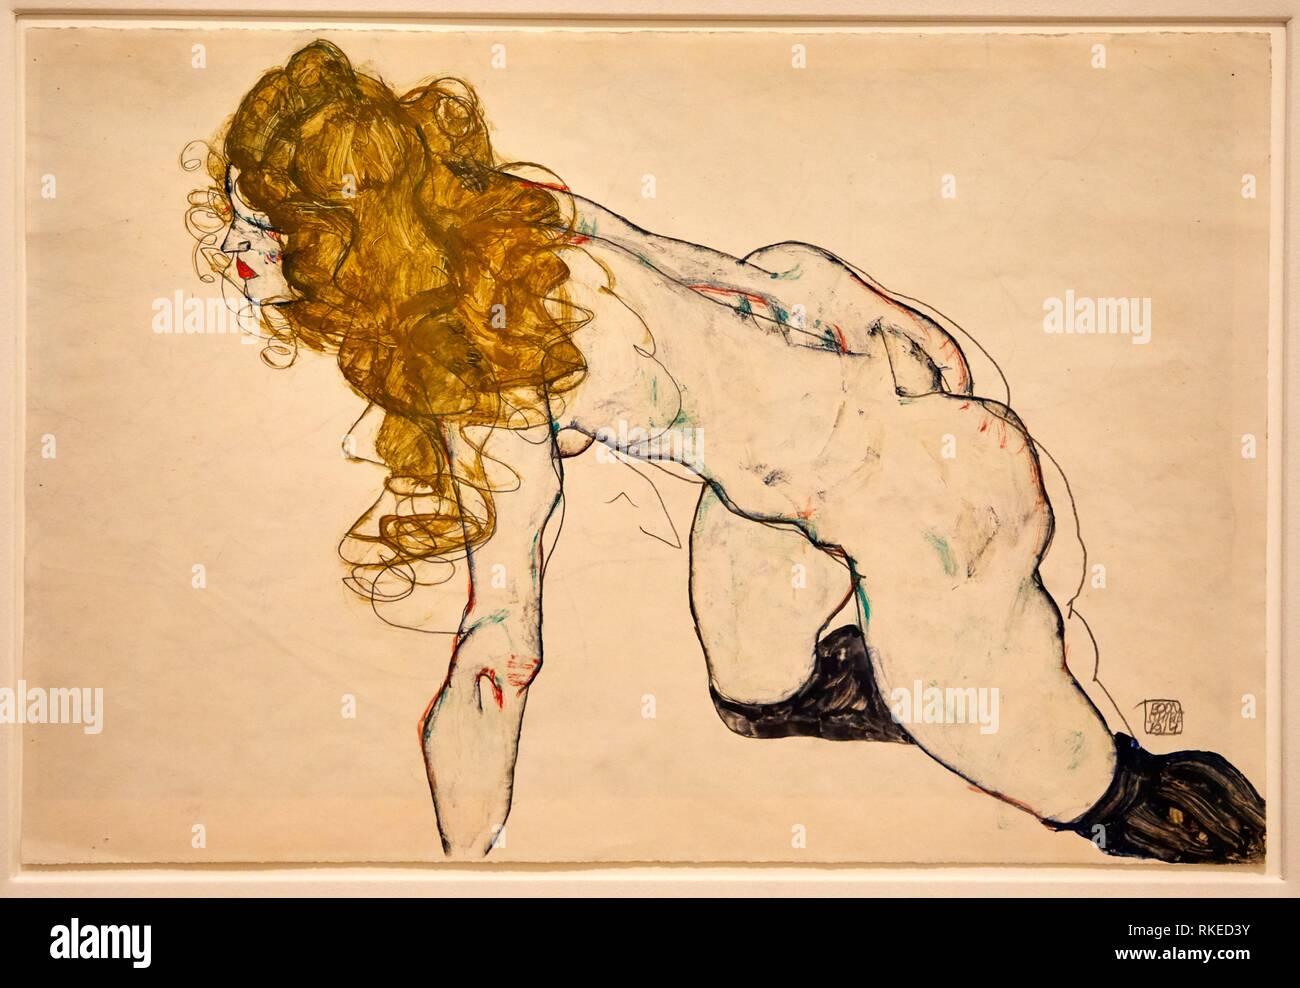 Egon Schiele, Kauernder weiblicher Akt mit blonden Haaren und aufgestütztem linken Arm, Femme aux cheveux blonds dénudée à genoux et appuyée sur le - Stock Image